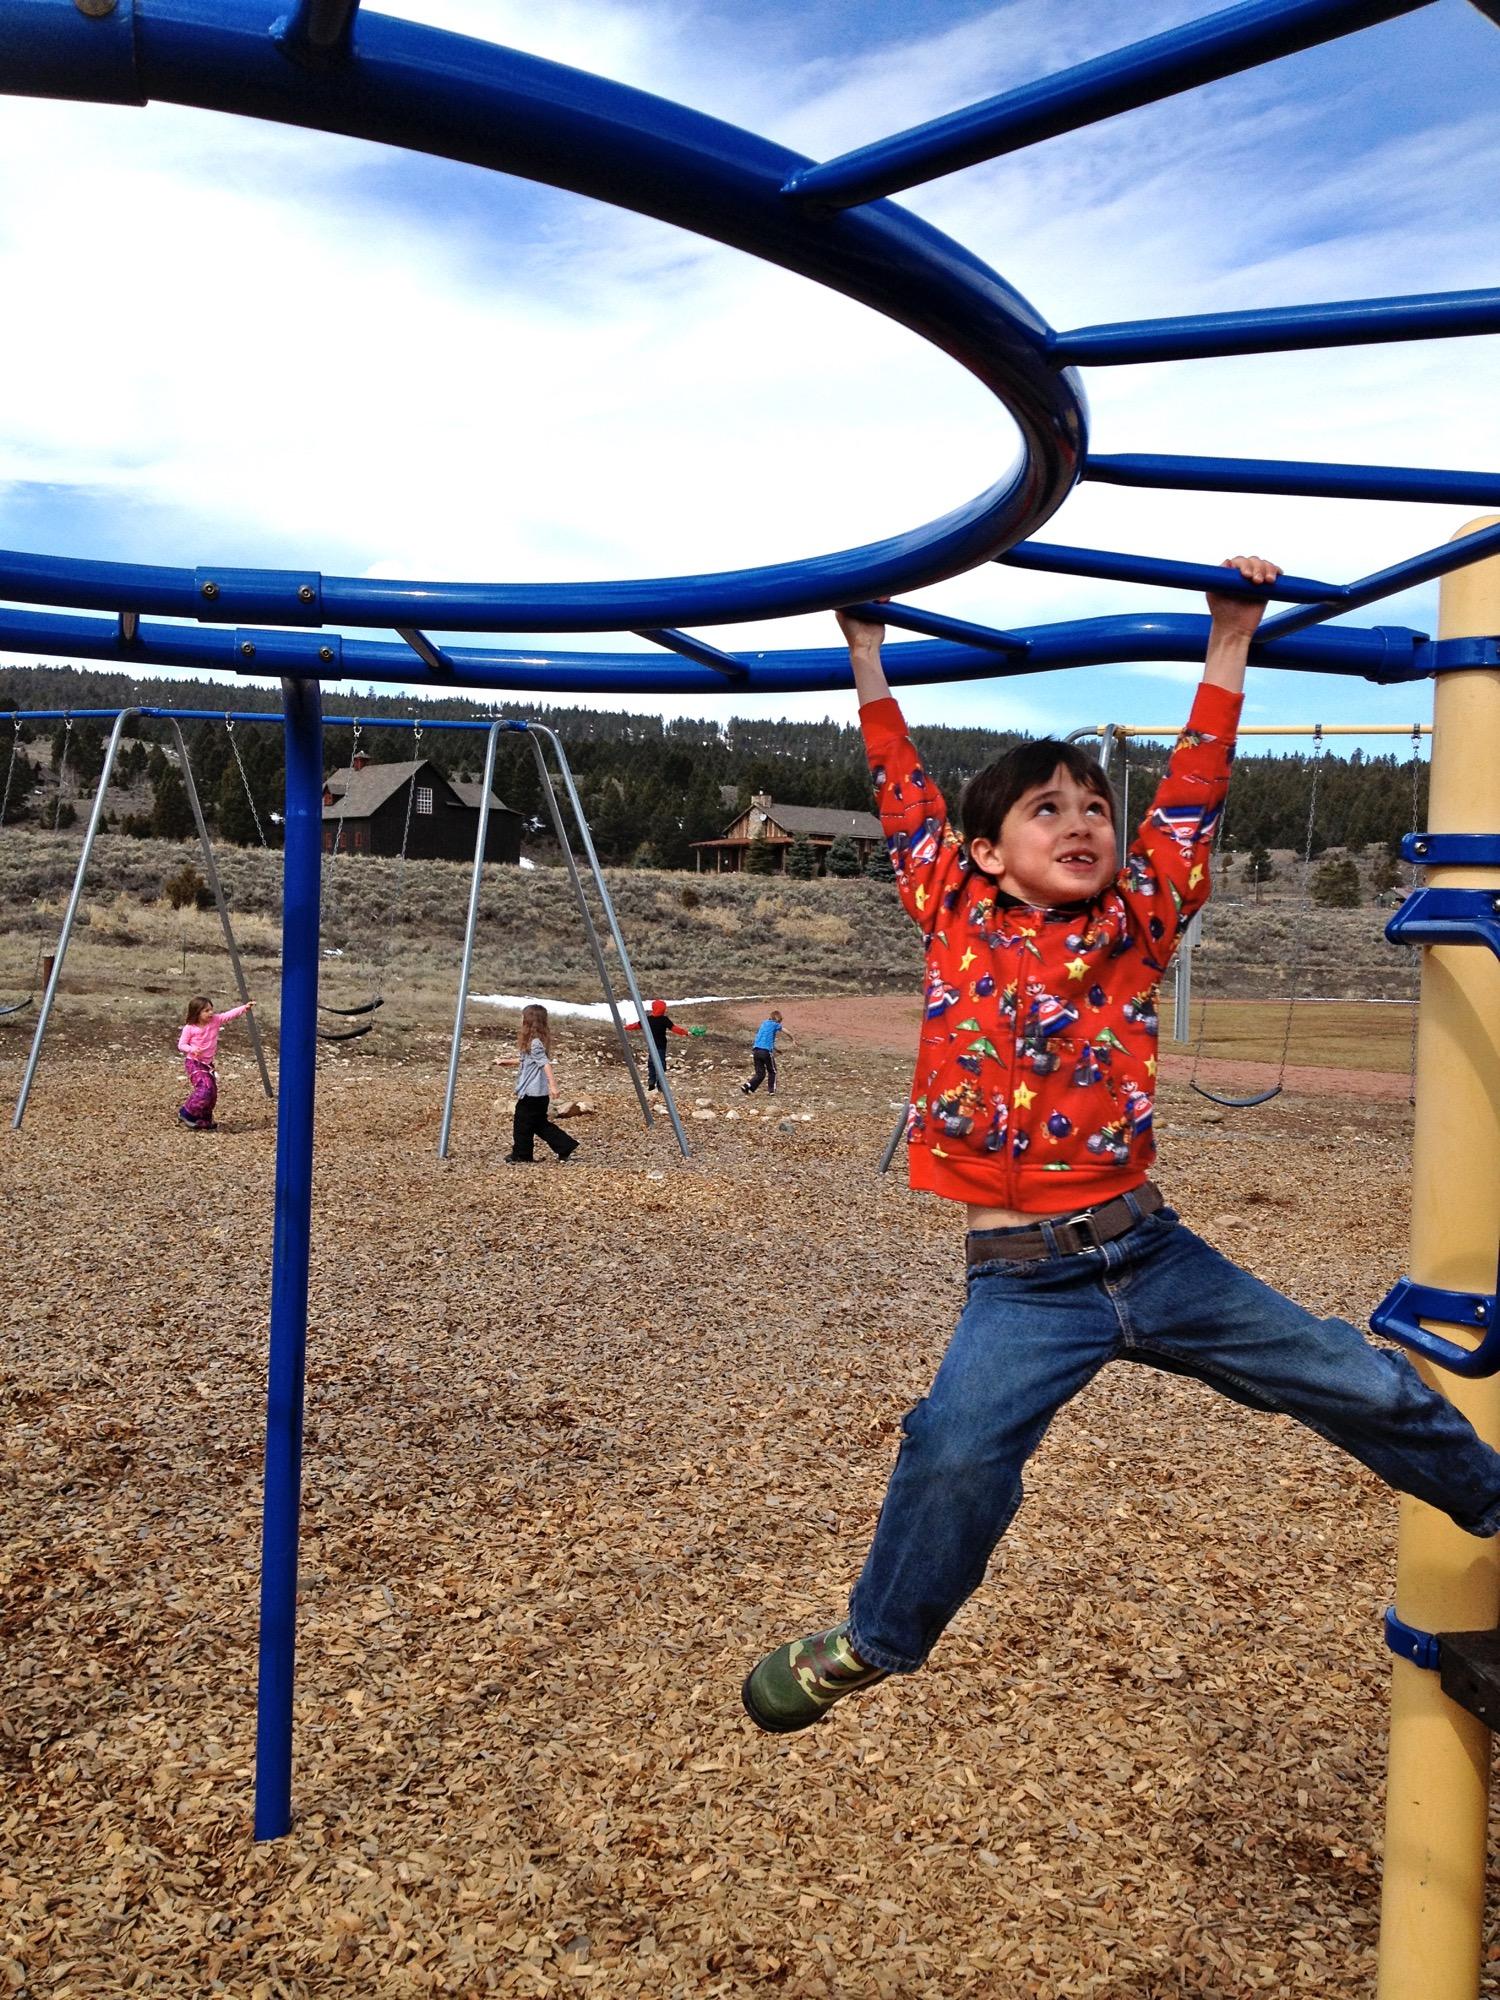 Monkeying around at Ophir School. Big Sky, Montana. (Photo by Emily Stifler Wolfe)